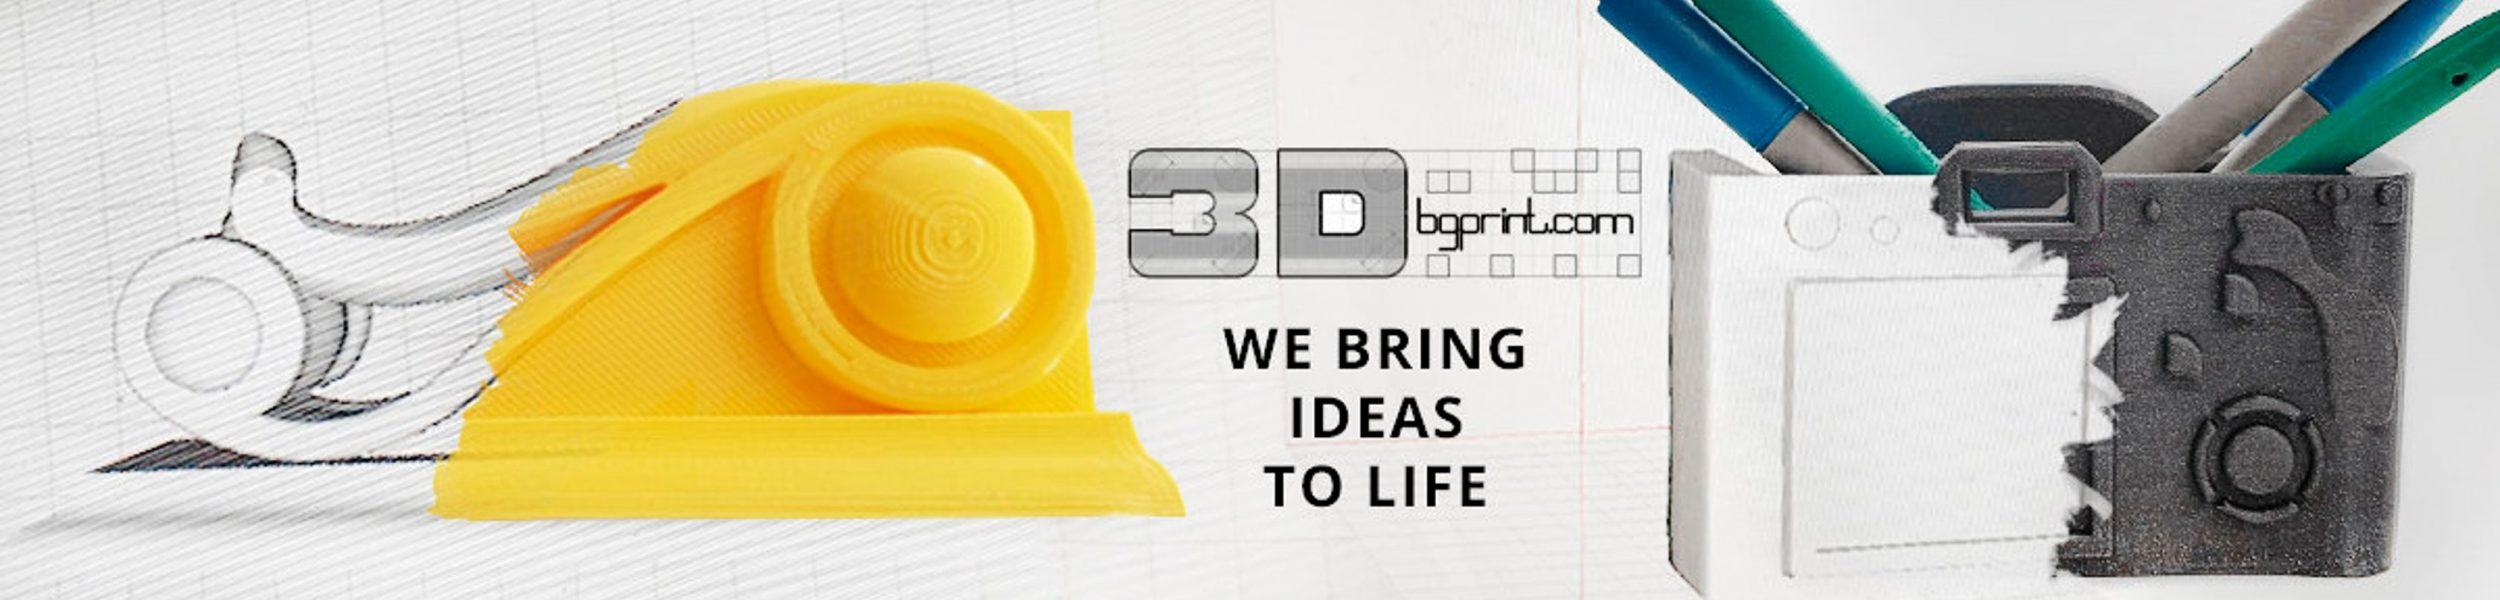 3Dbgprint modeling